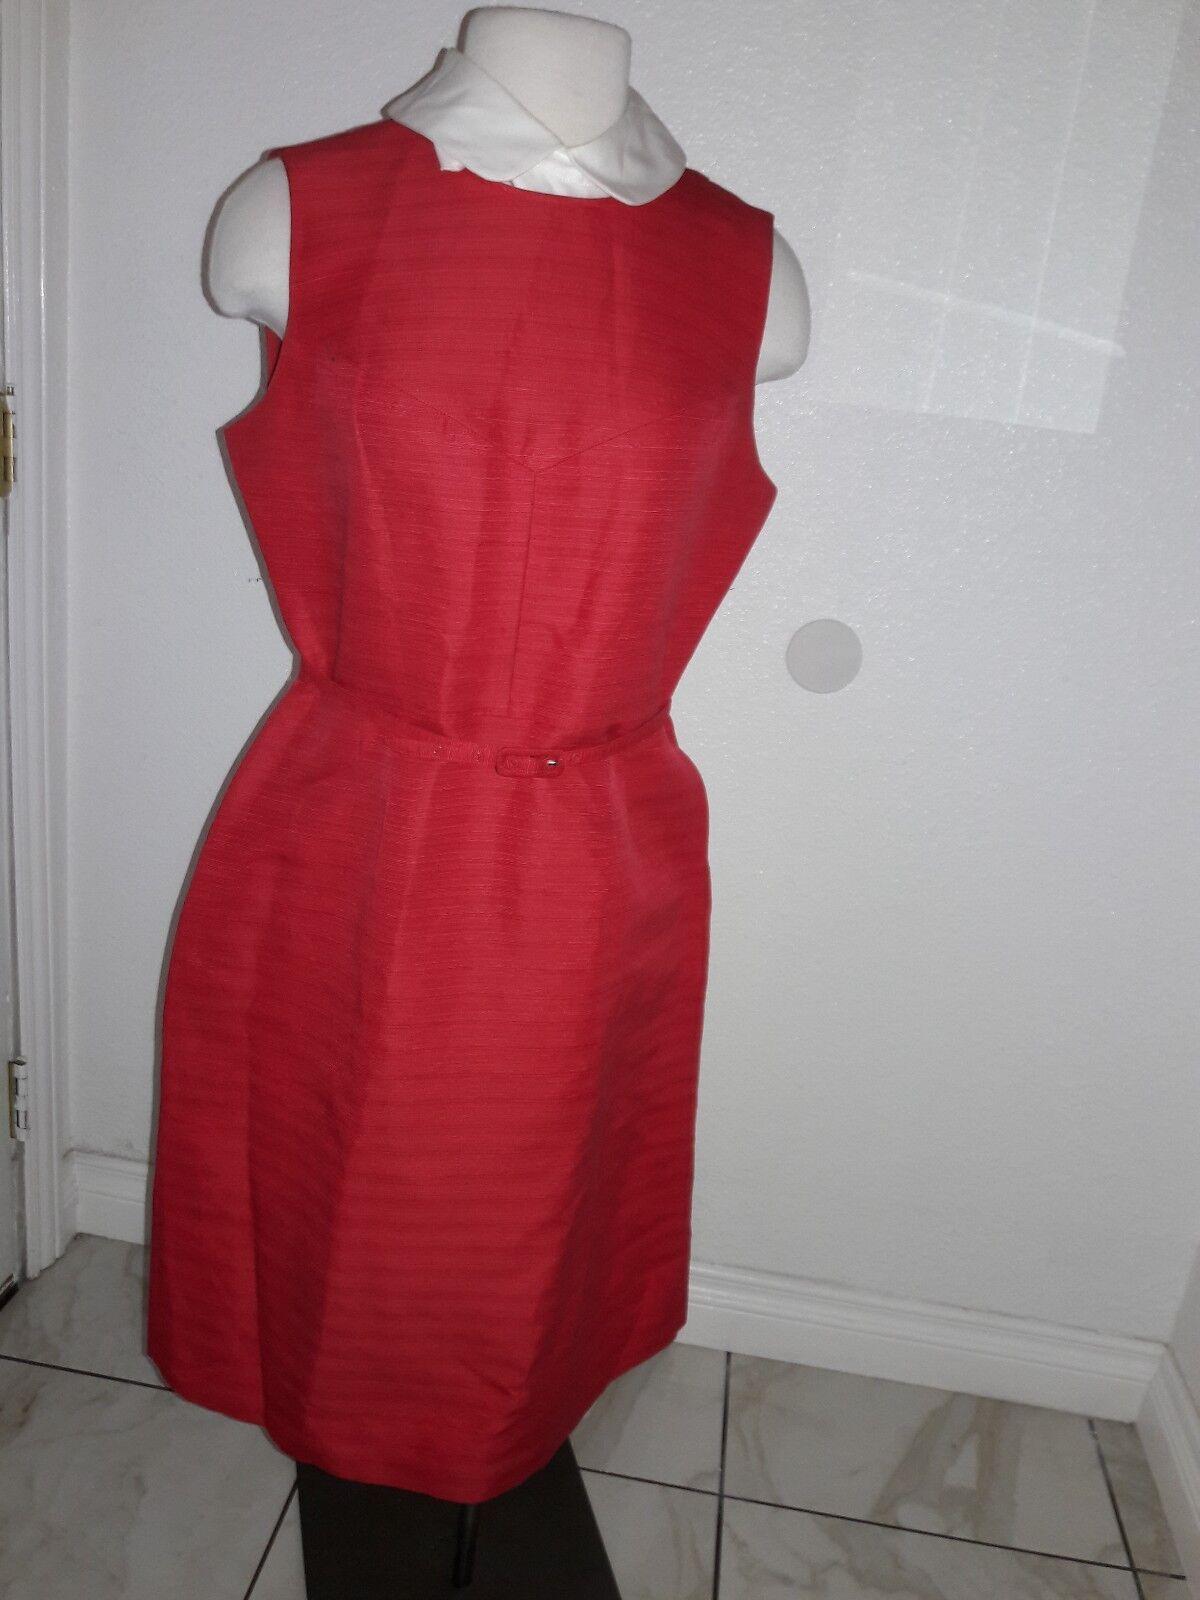 Tory Burch Dress  Sz 10 Red color Career